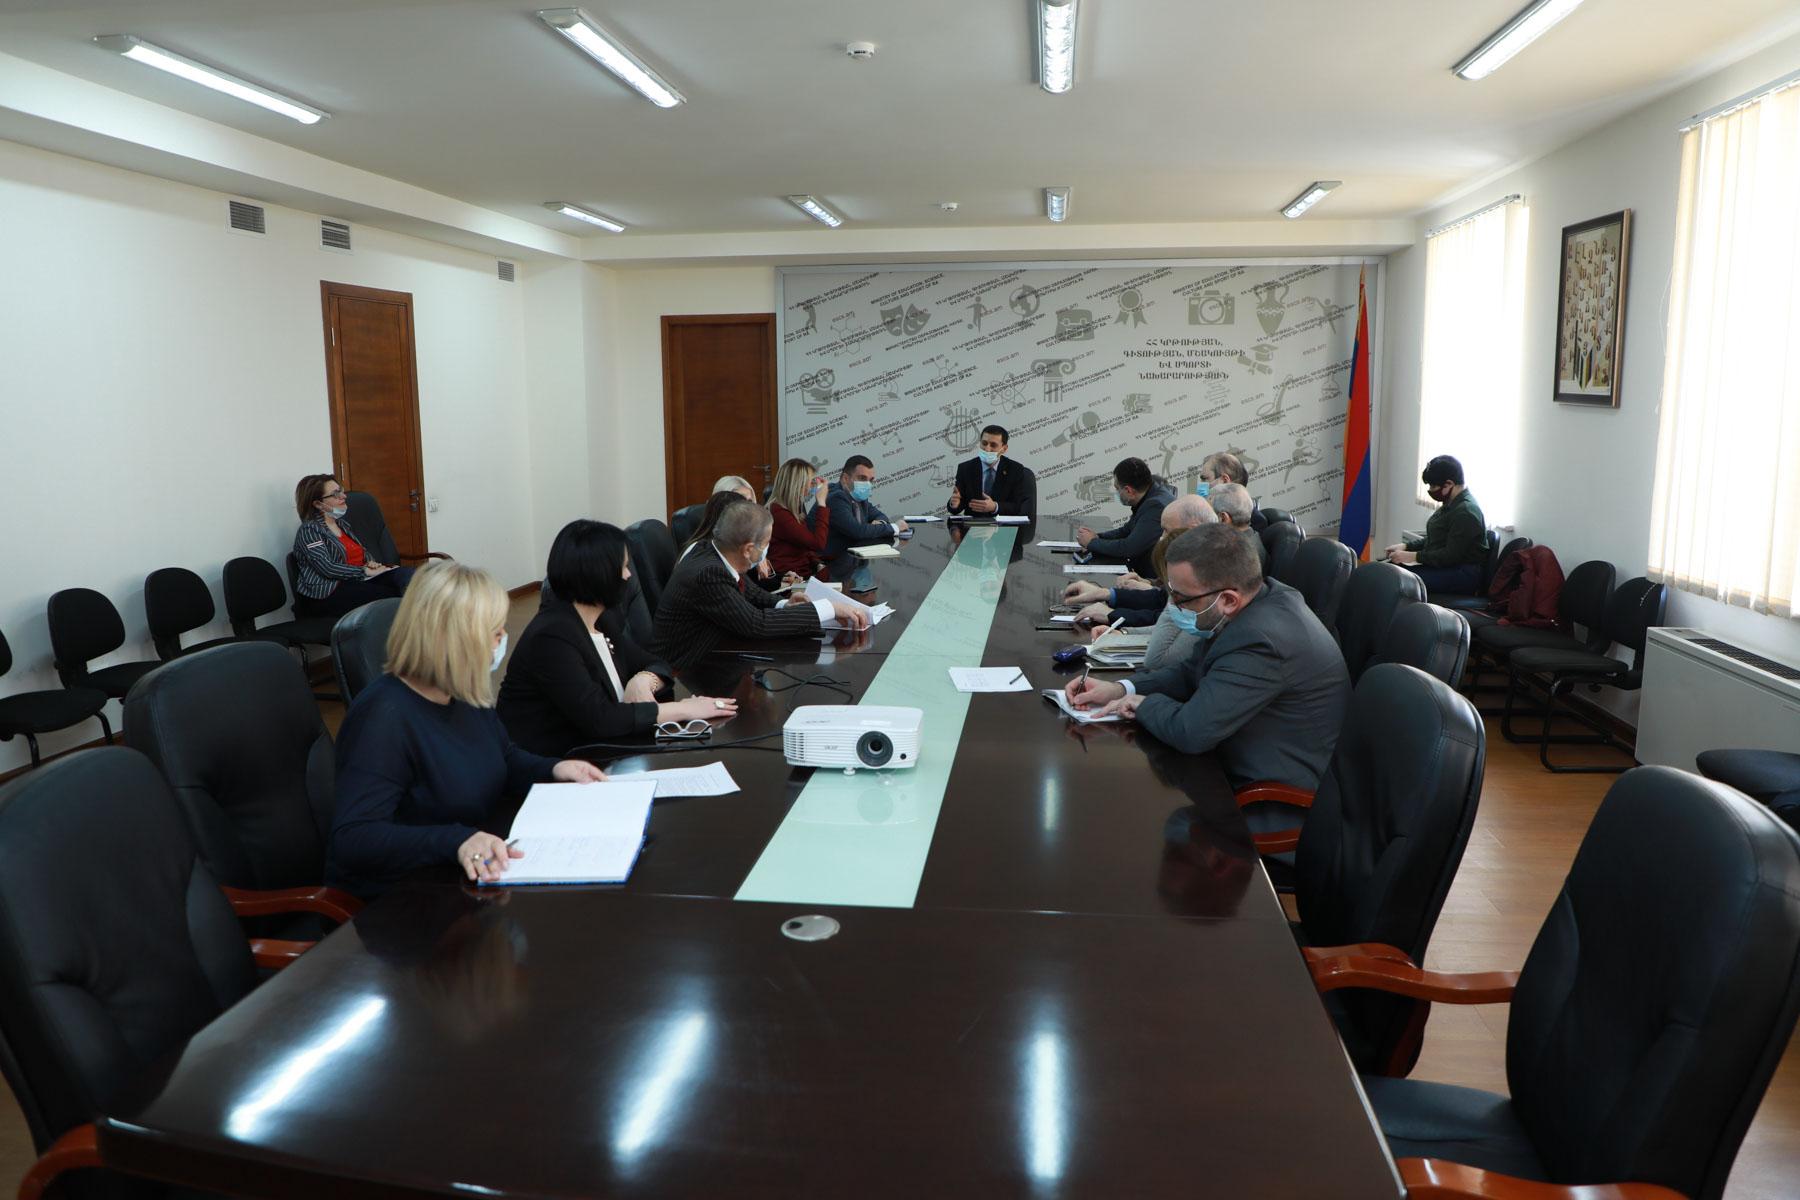 Photo of ԿԳՄՍ փոխնախարարները հանդիպել են բուհերի արտաքին կապերի պատասխանատուների հետ